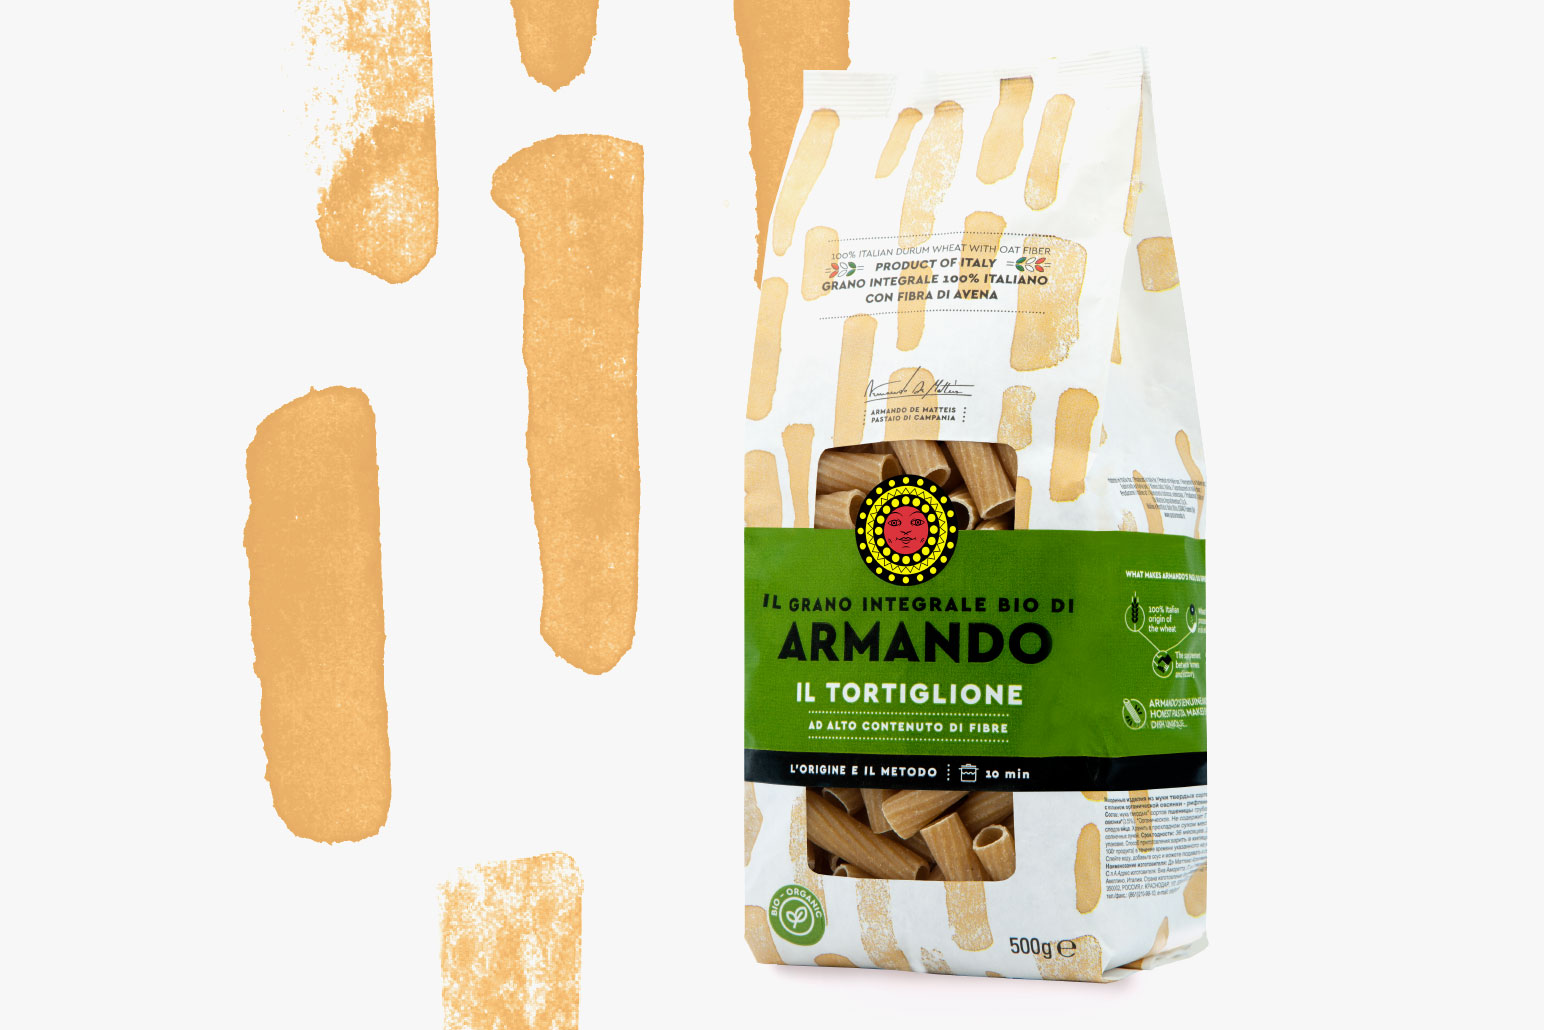 Pasta Armando packaging